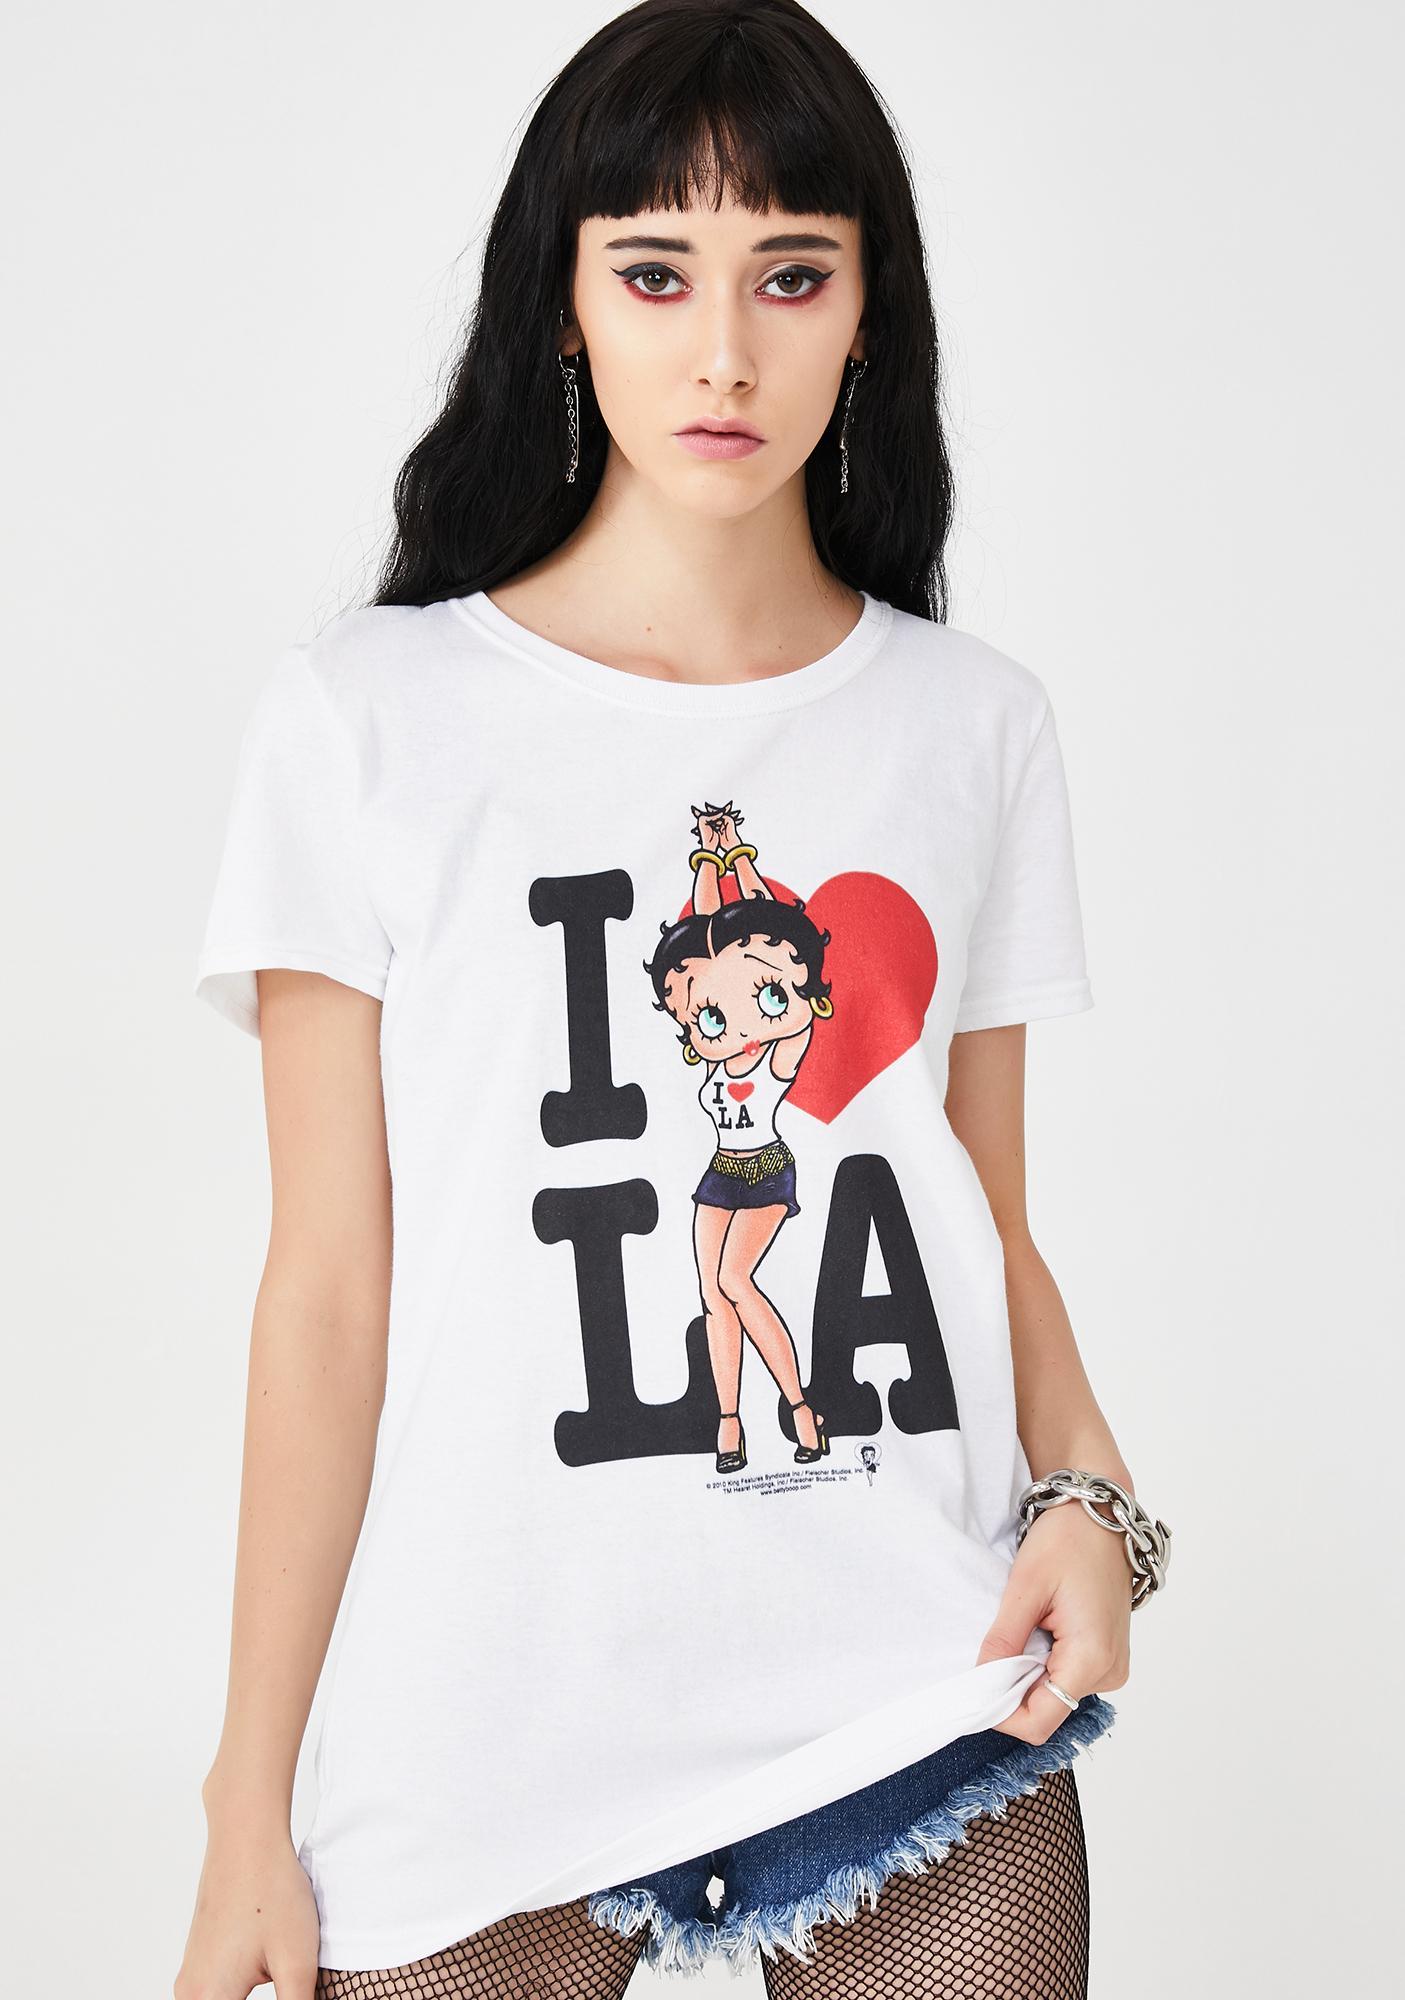 Betty Loves LA Graphic Tee